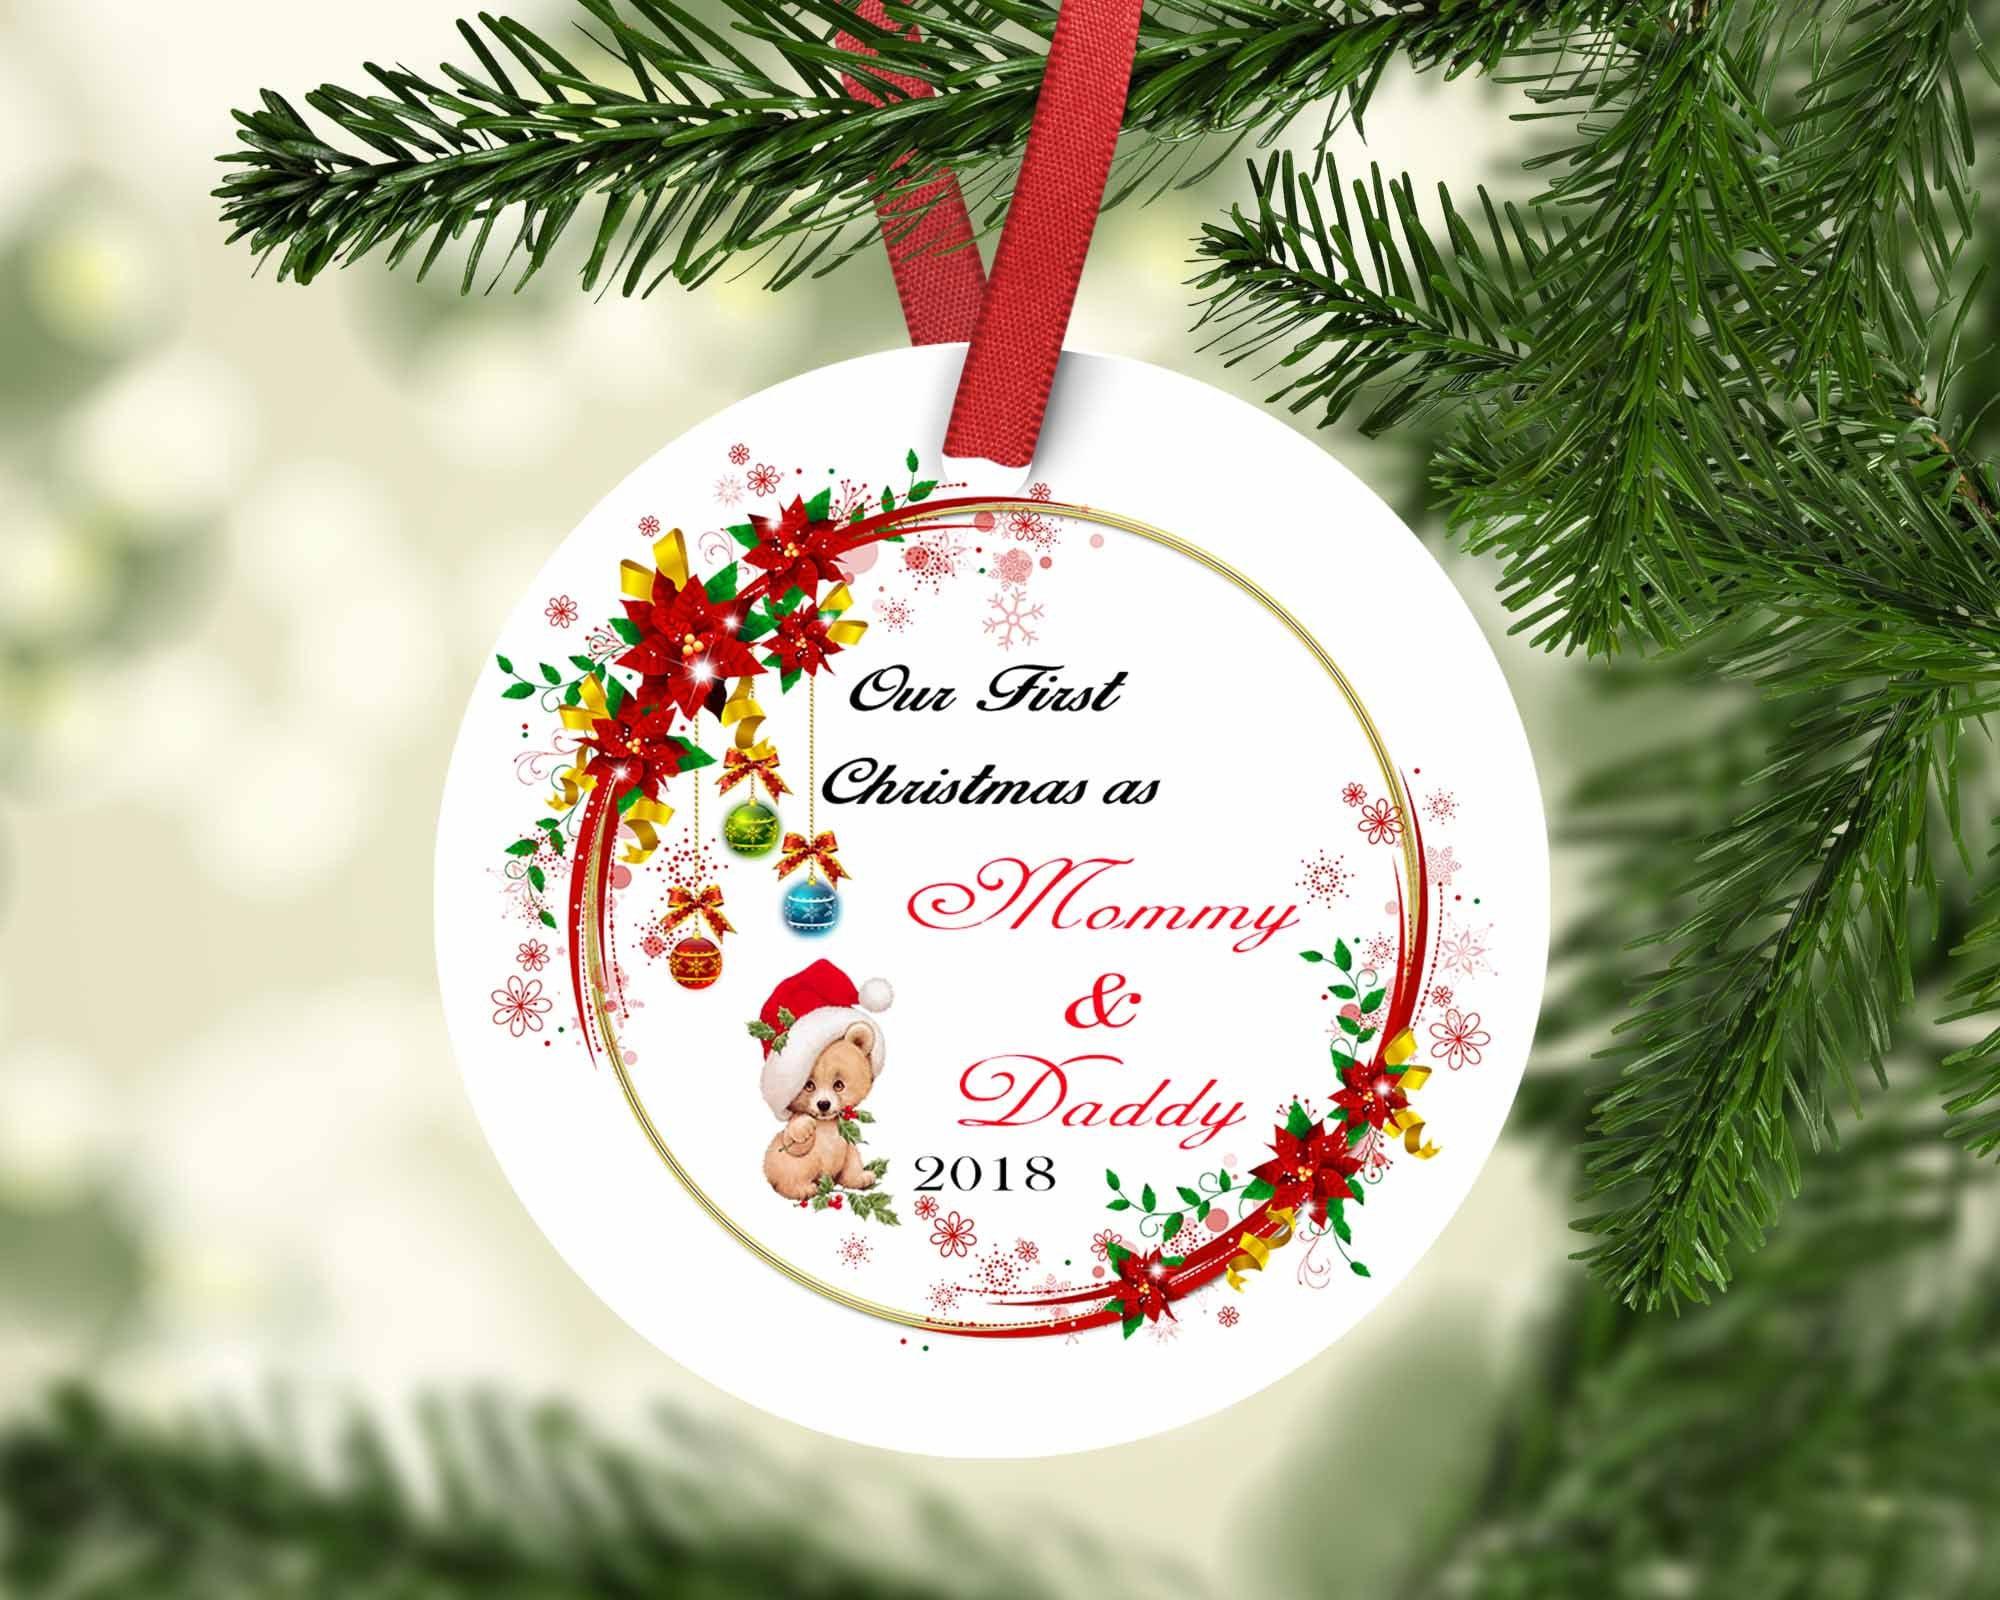 Merry Christmas Ornament,Housewarming Gift,Ornament,Christmas,Custom ...